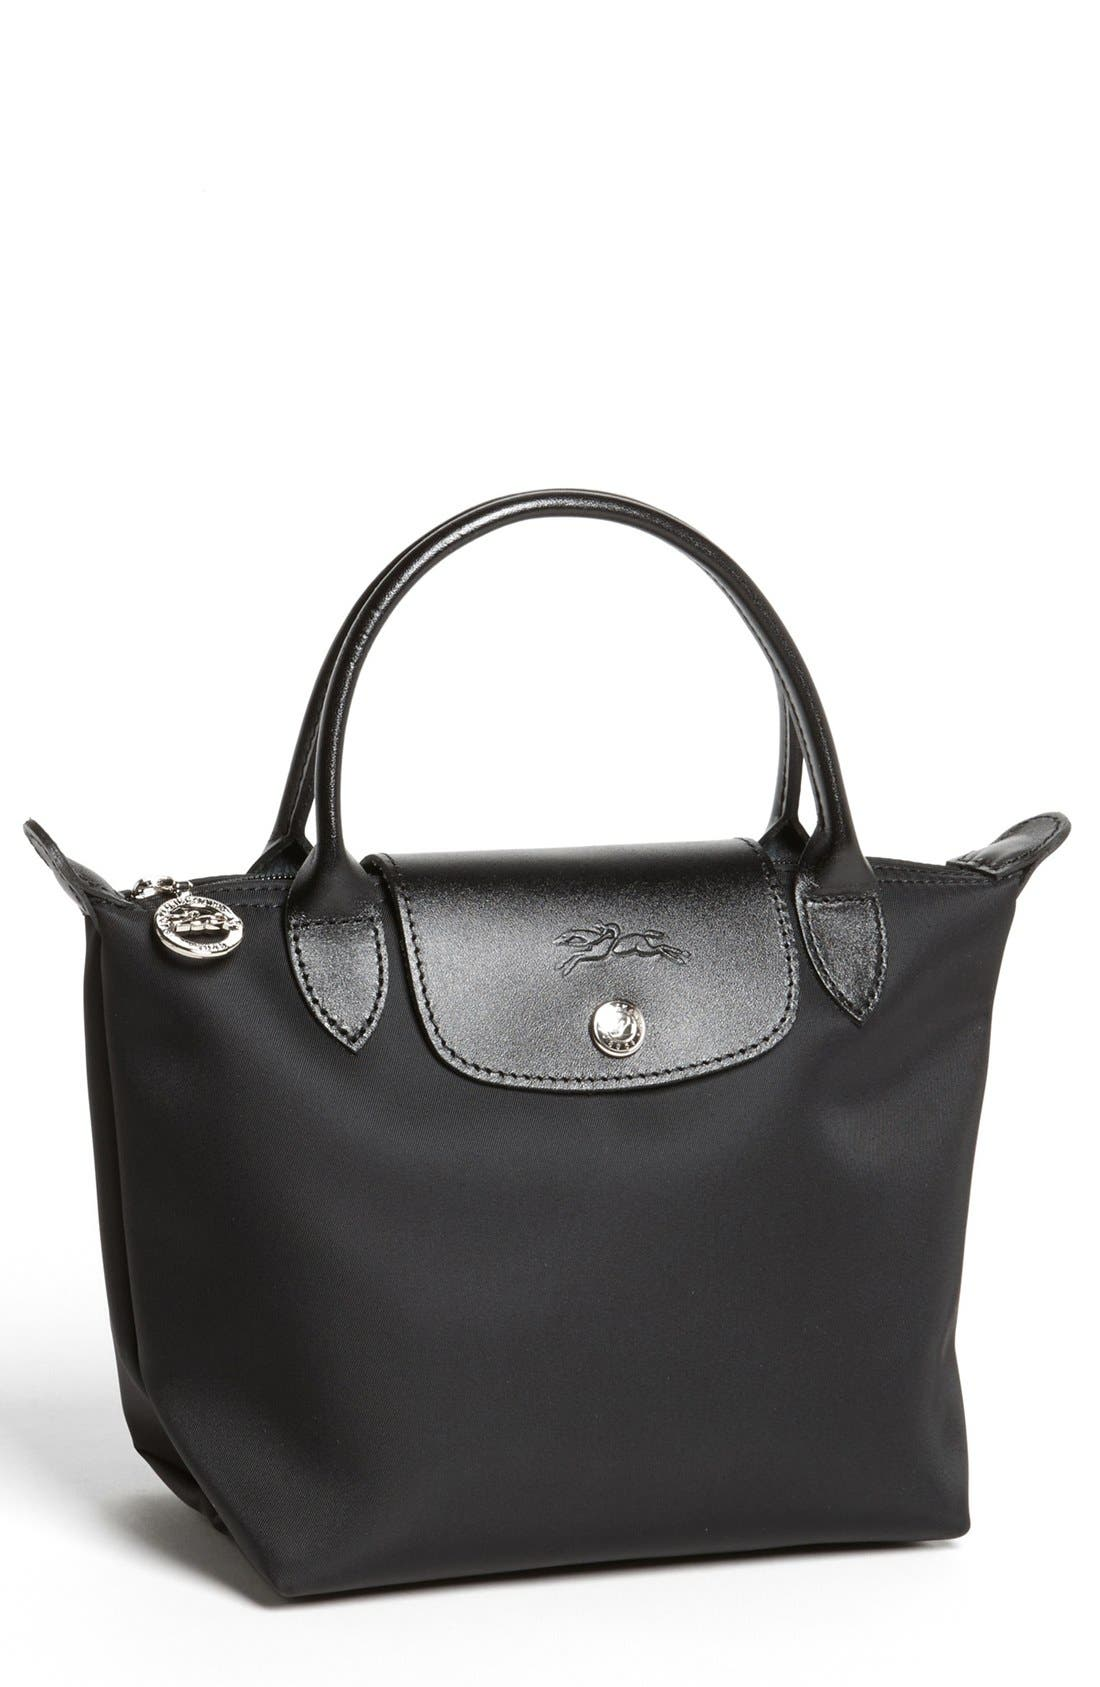 Alternate Image 1 Selected - Longchamp 'Deposé - Mini' Bag